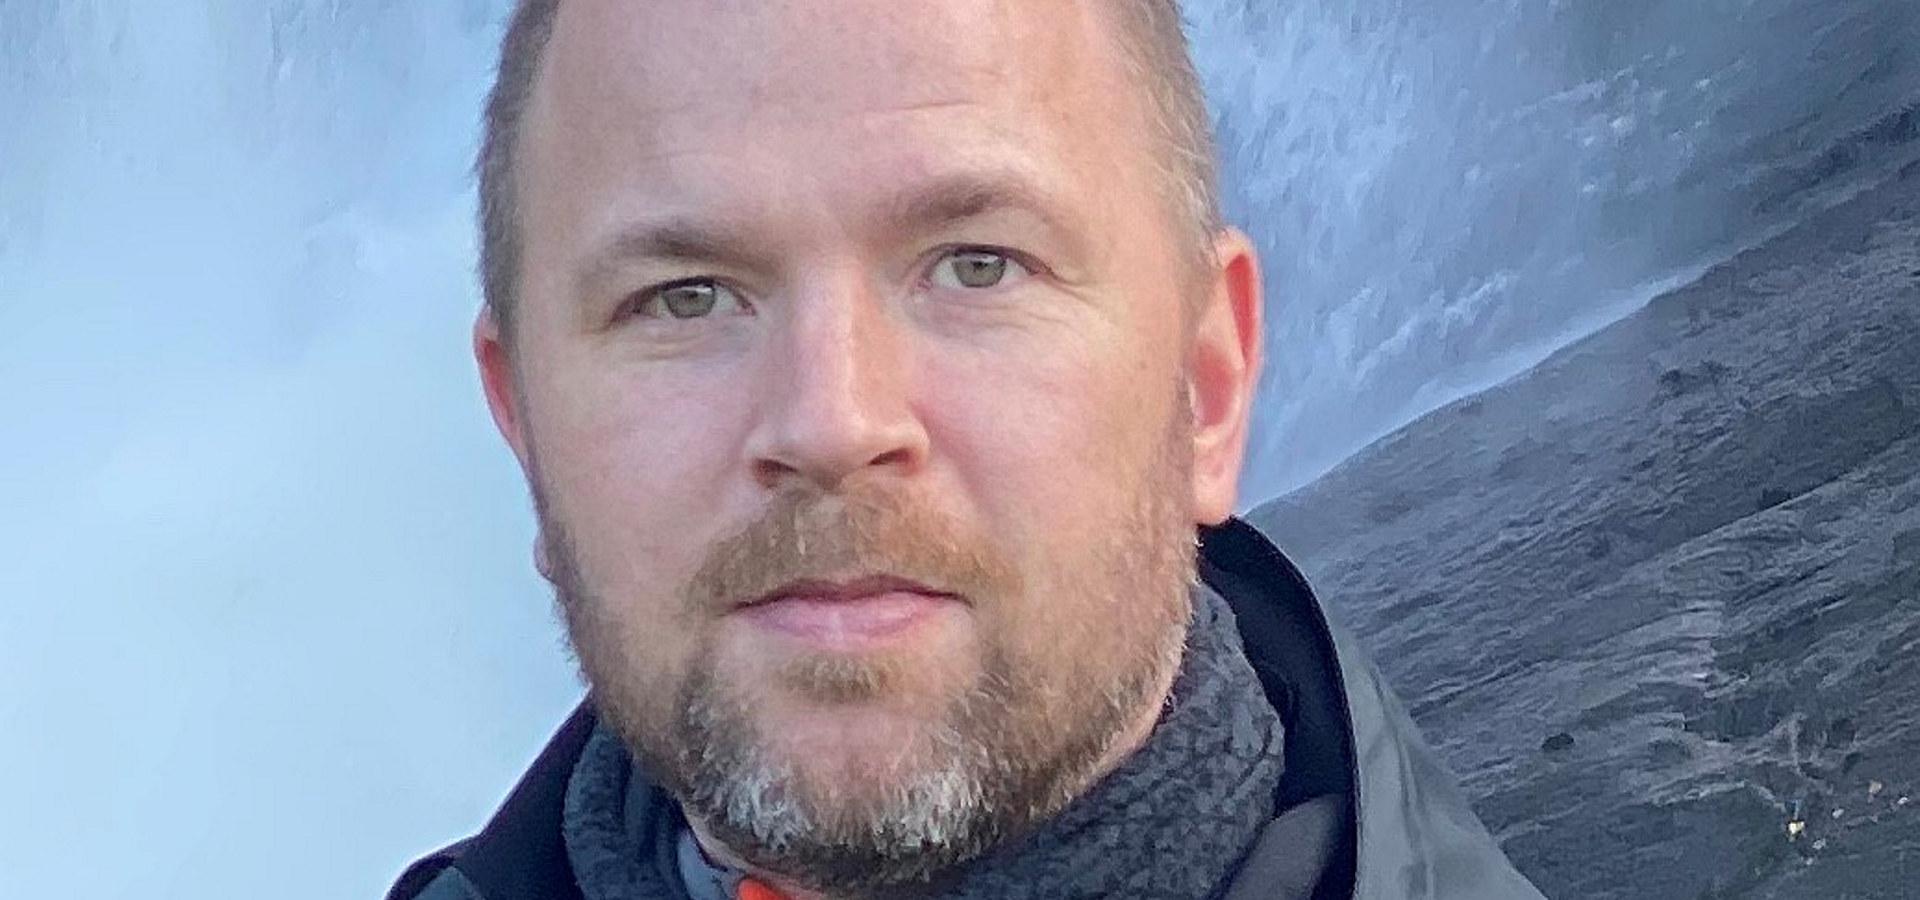 Kristian Henriksen, ingeniør og leder for robotisering og teknologi i Beerenberg Services. Foto: privat